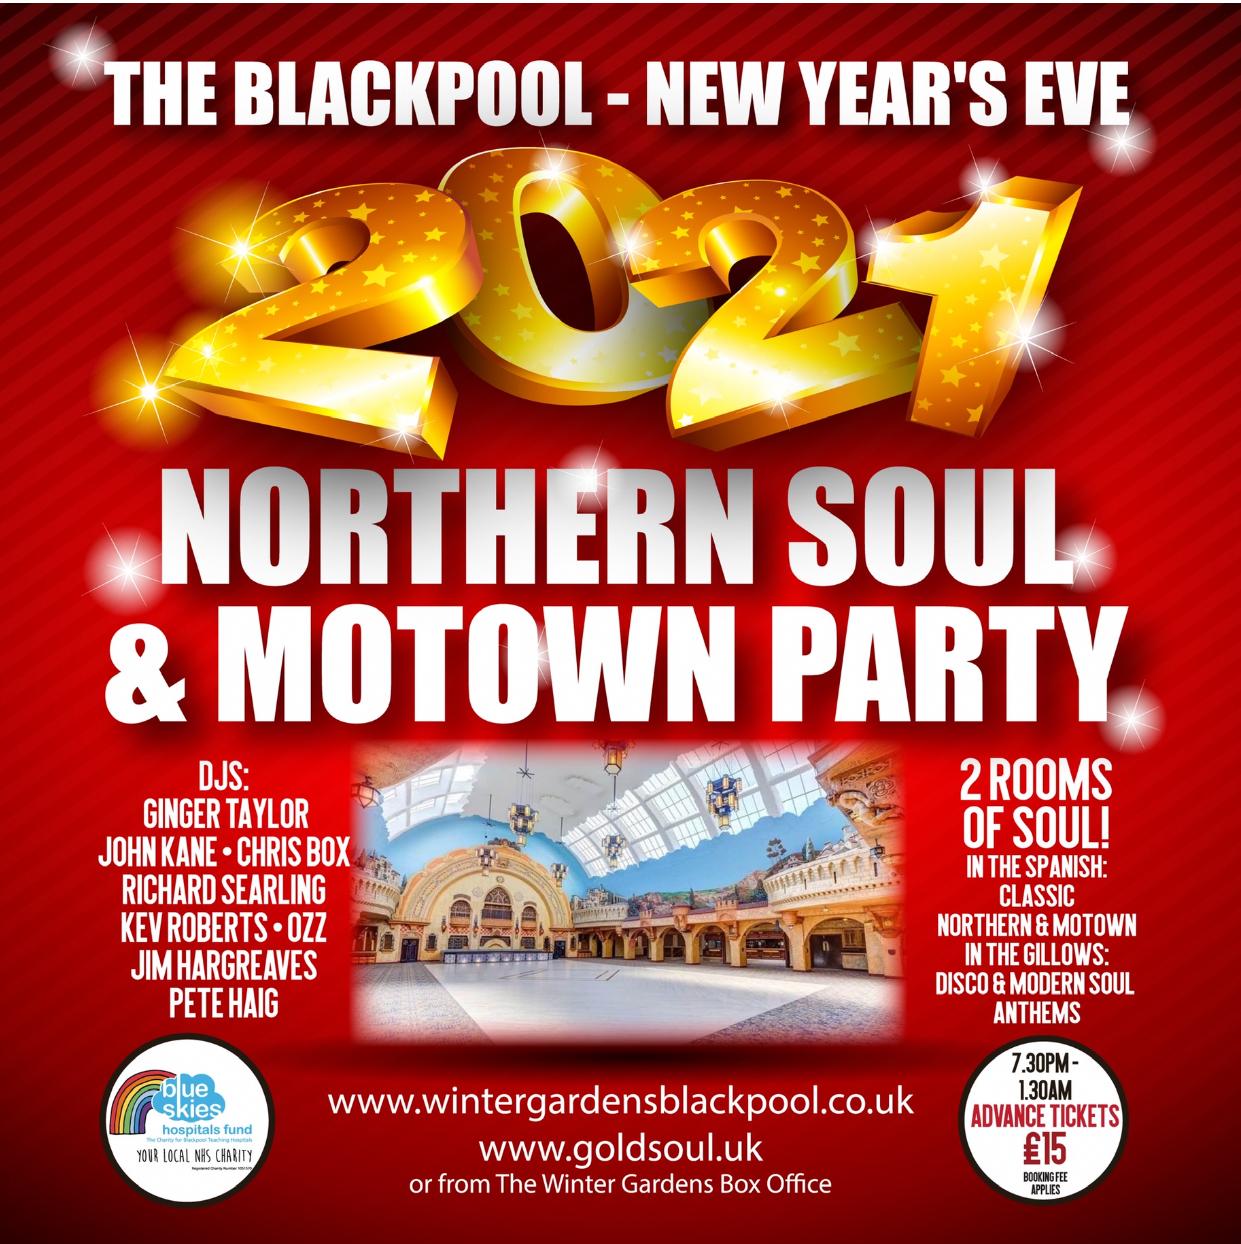 Blackpool Winter Gardens flyer